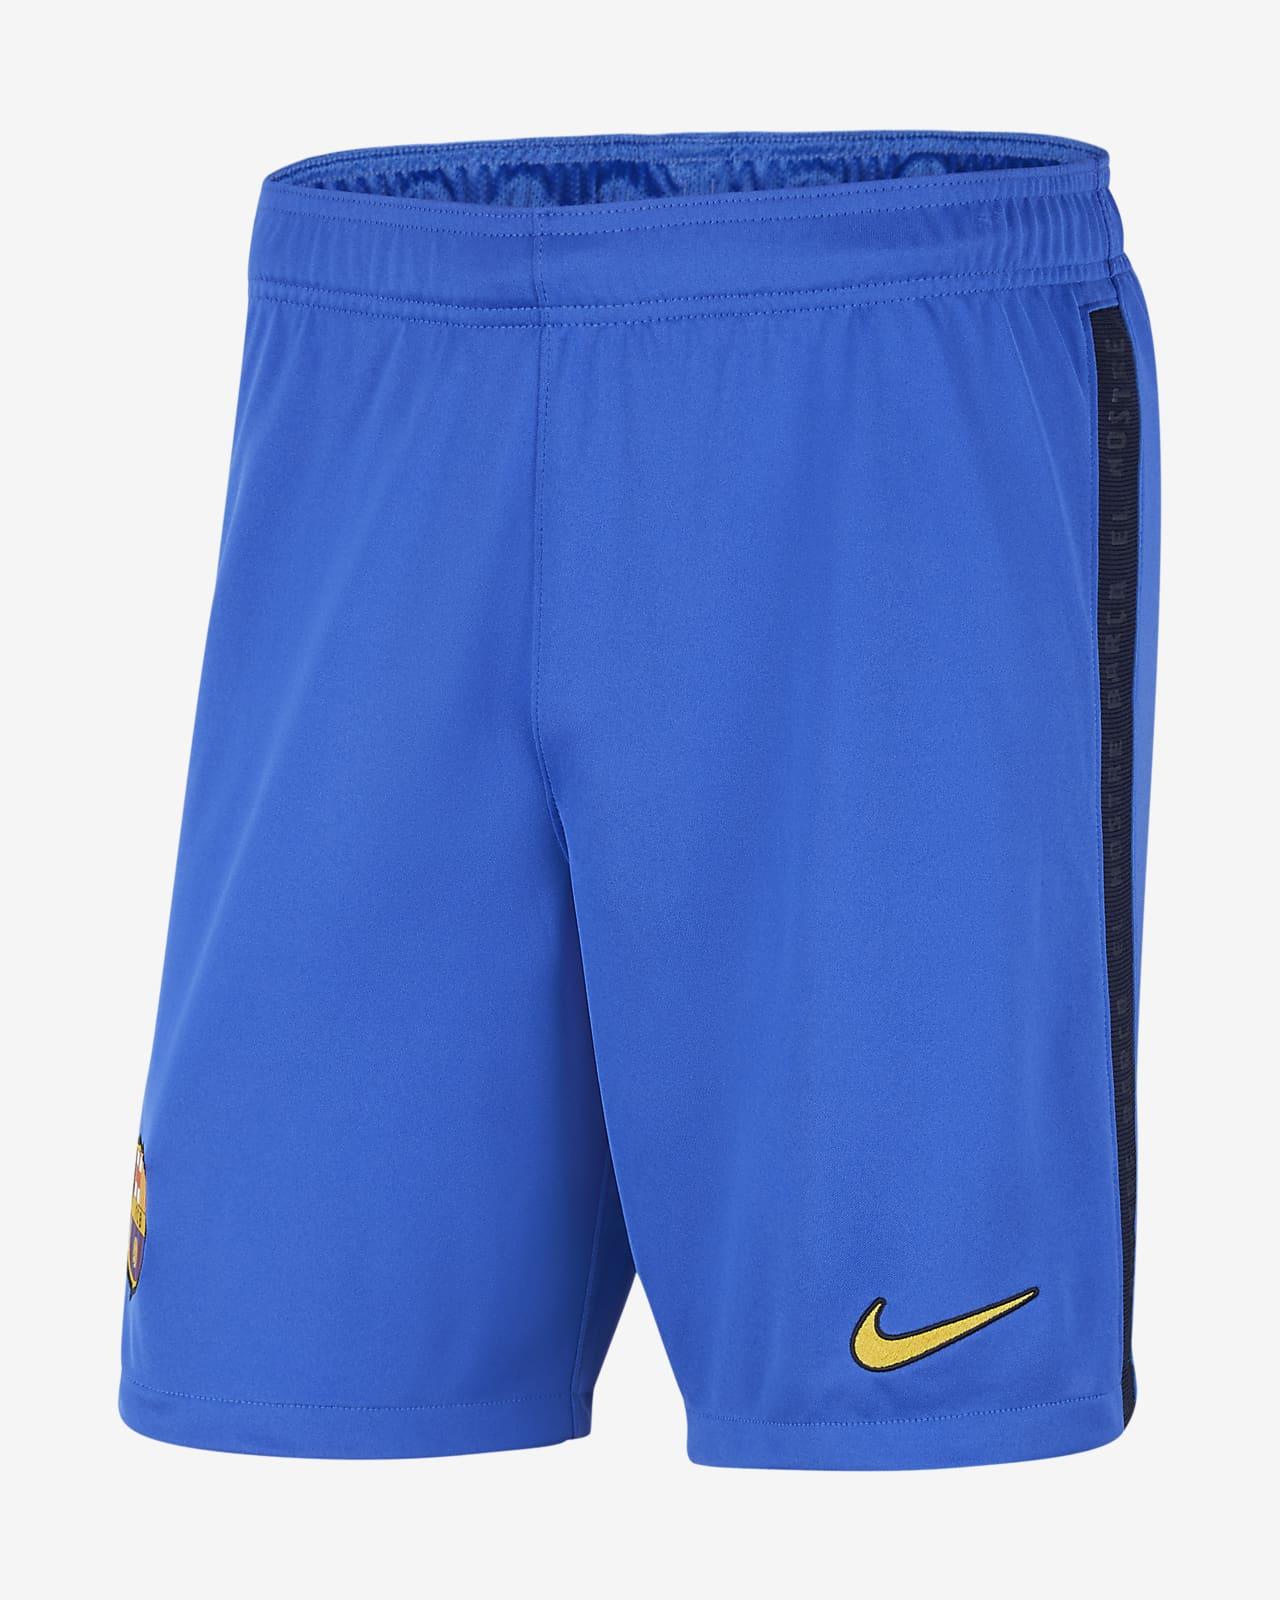 F.C. Barcelona 2021/22 Stadium Third Men's Nike Dri-FIT Football Shorts